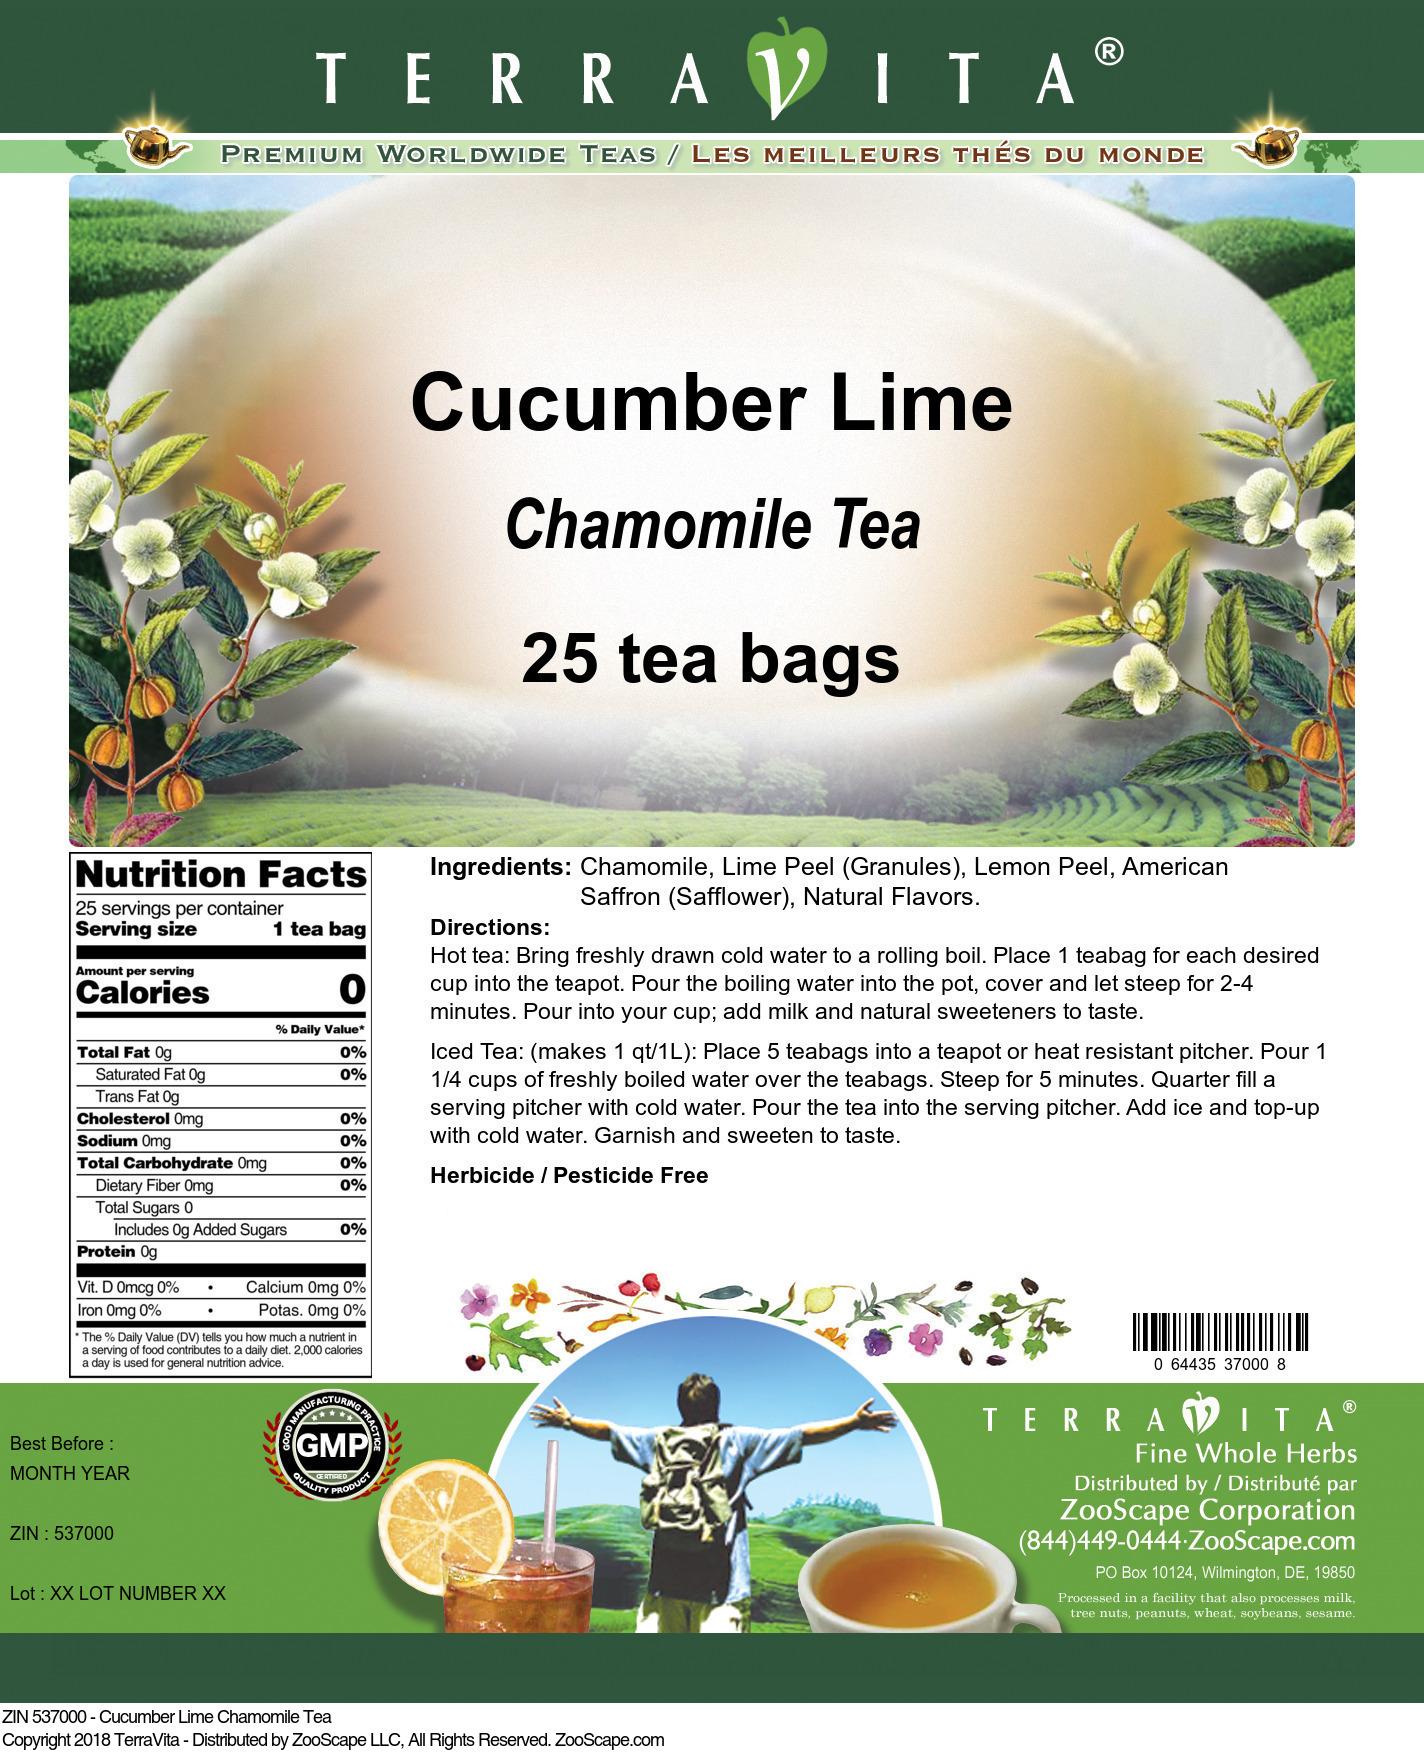 Cucumber Lime Chamomile Tea